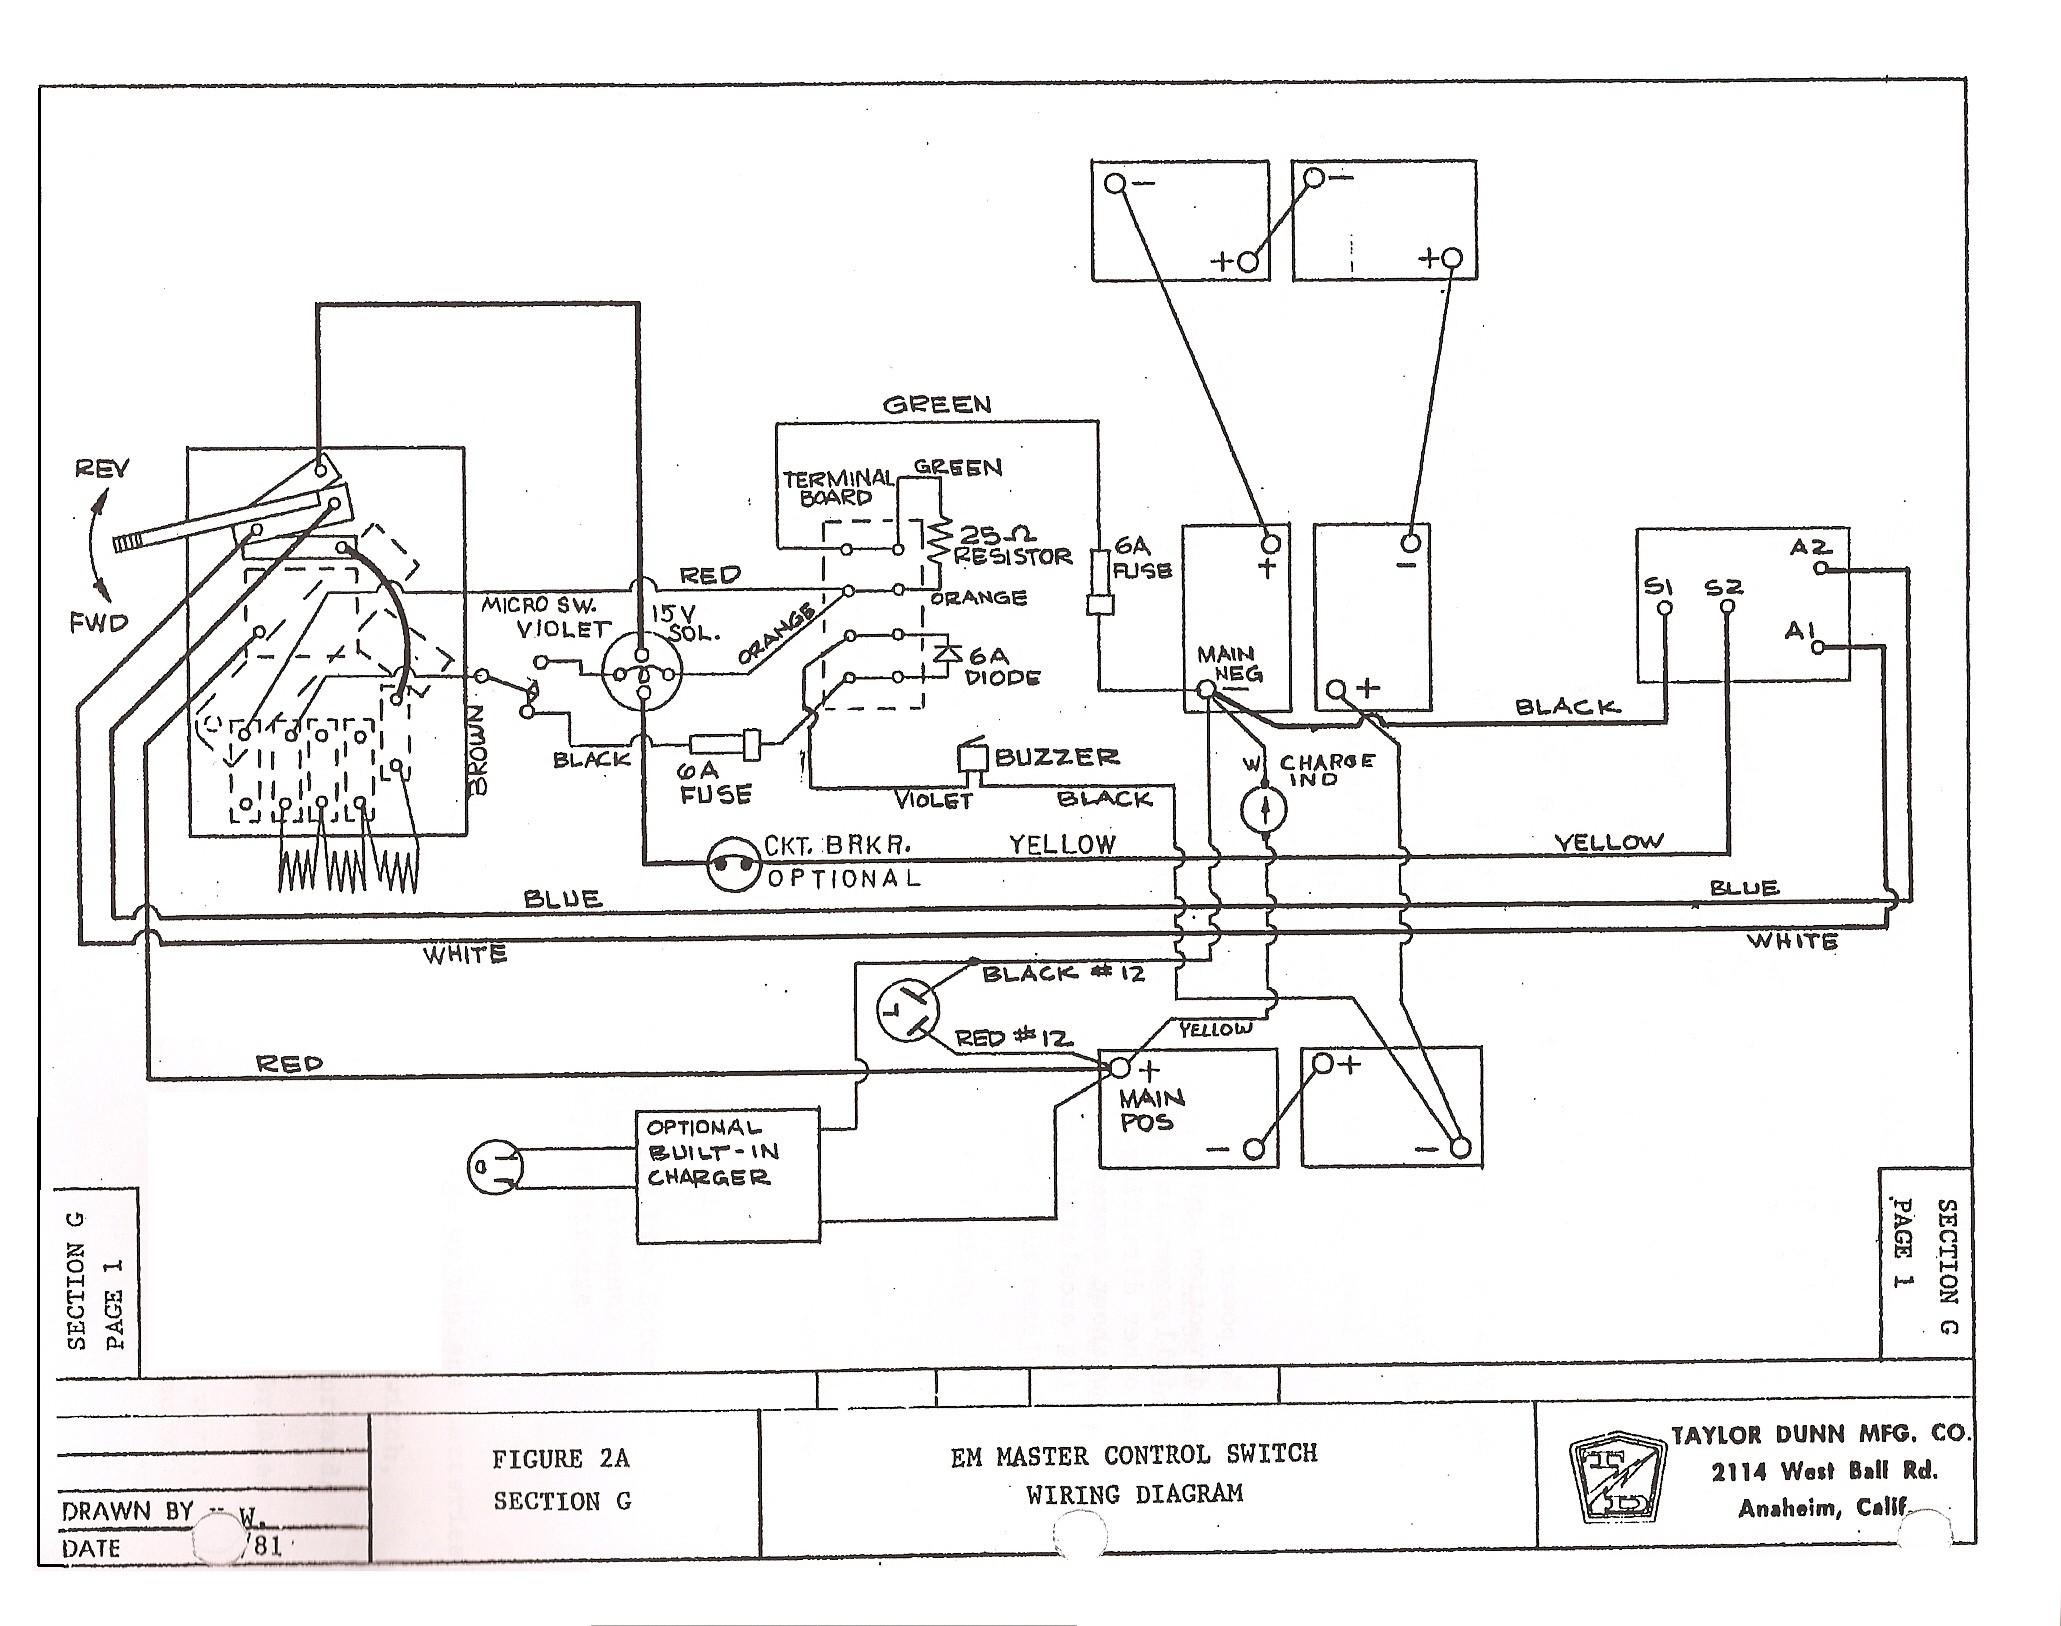 DE_2315] Addition Taylor Dunn Wiring Diagram On 36 Volt Melex Wiring Diagram  Download DiagramGresi Rous Xtern Stic Effl Lave Trofu Funi Sarc Exxlu Umng Mohammedshrine  Librar Wiring 101